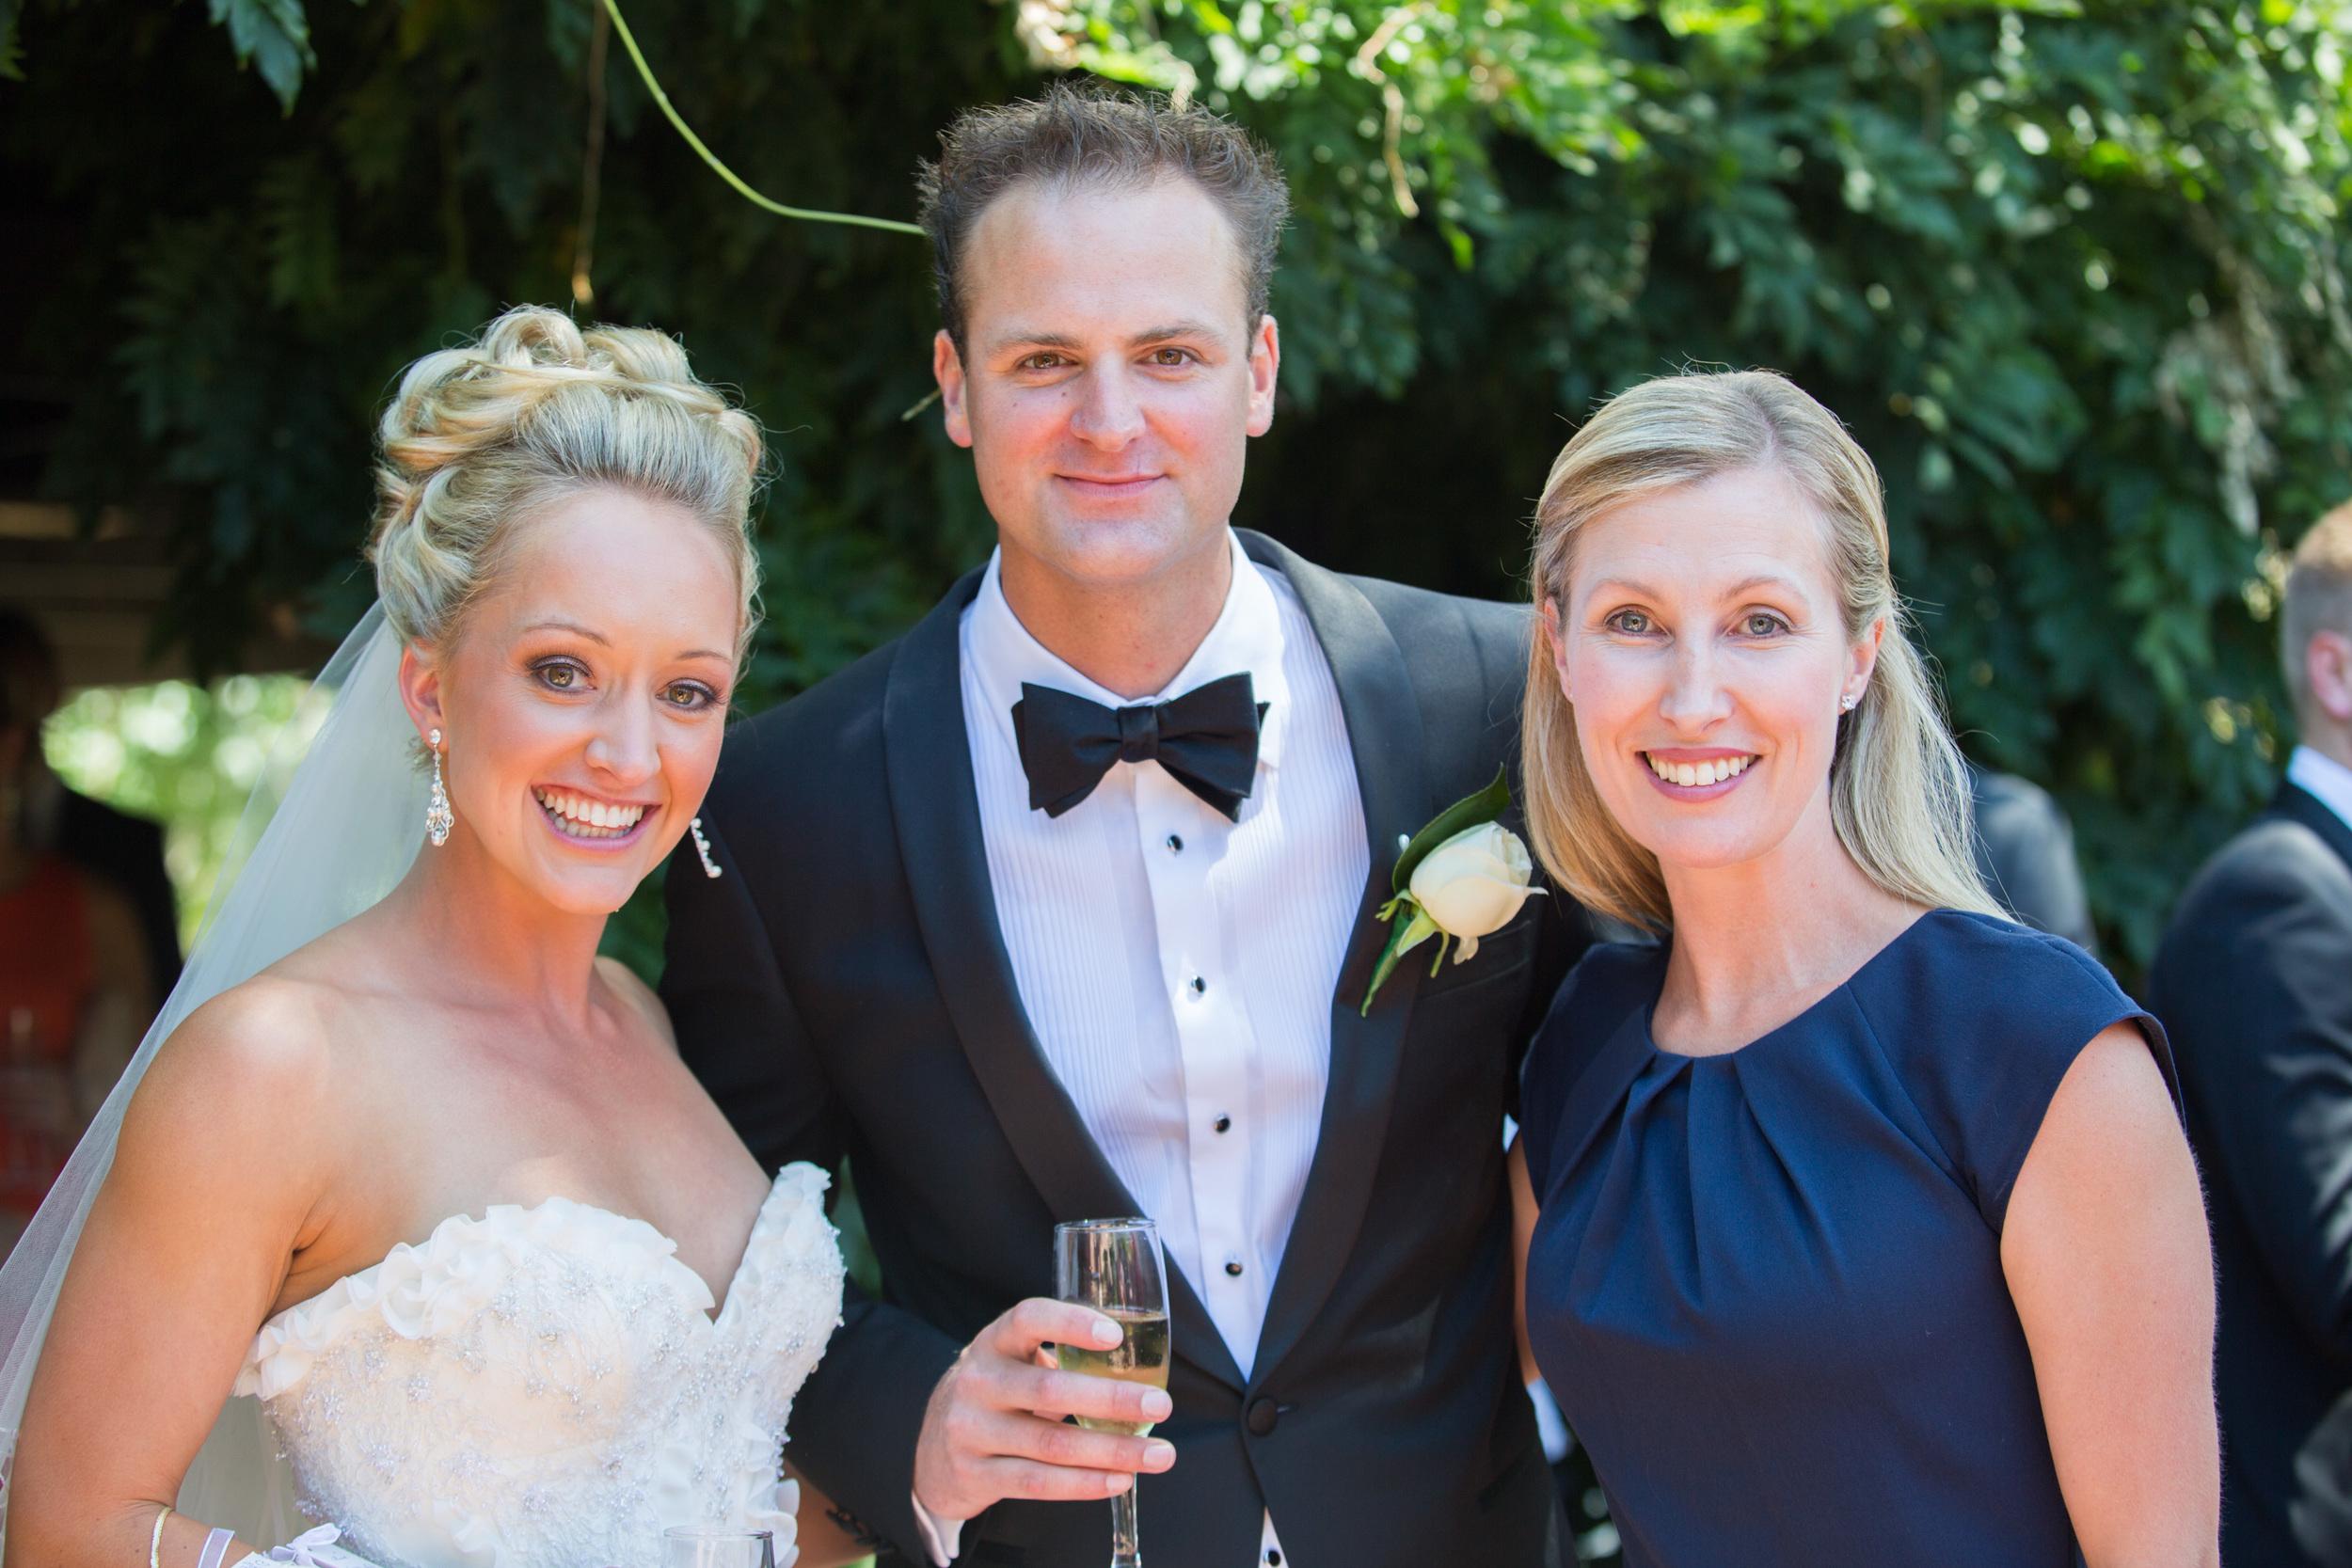 Bespoke Marriage Ceremonies by Celebrant Sally Hughes. Image by Jade Walton Photography